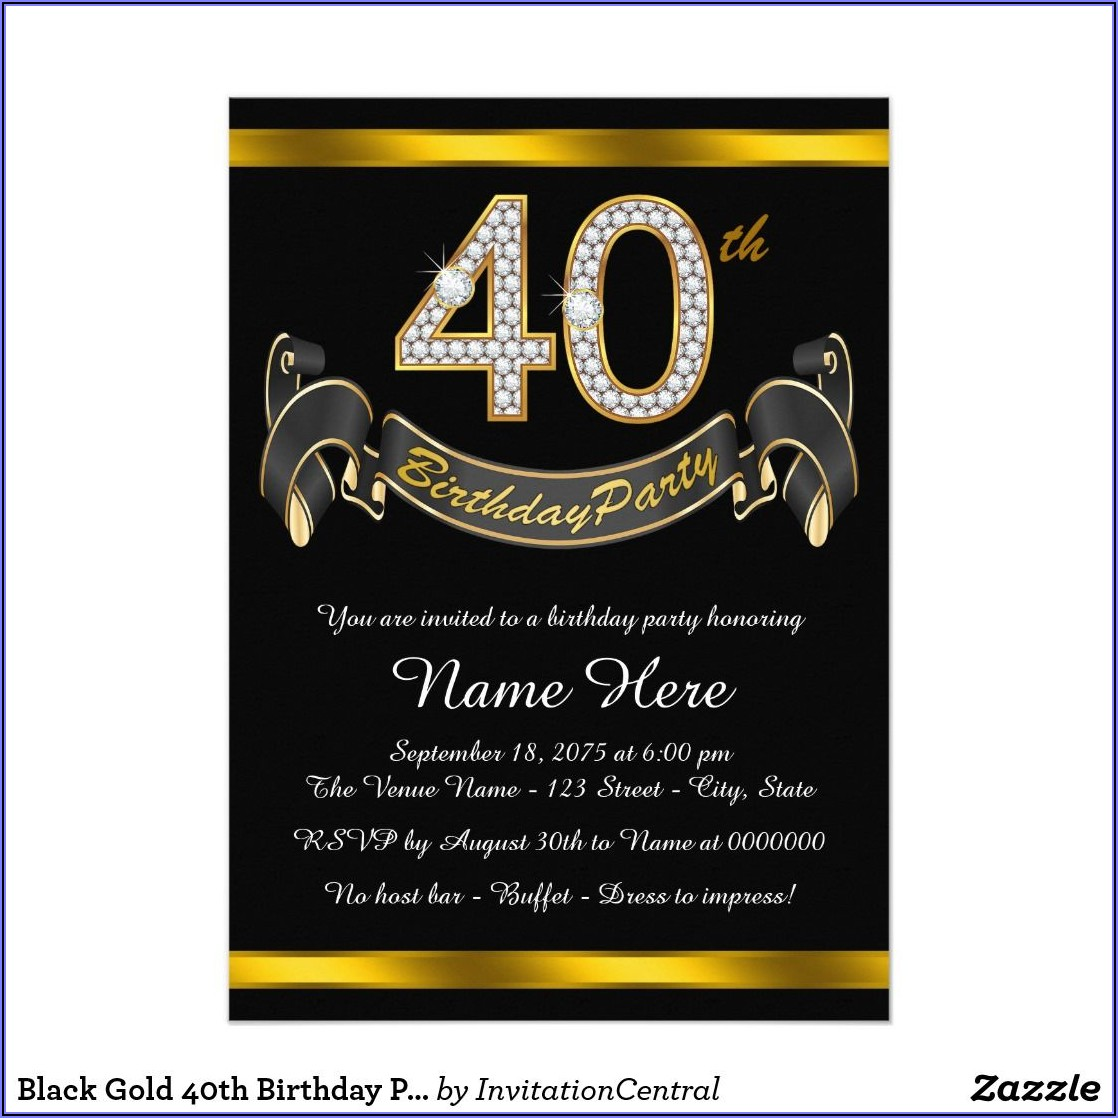 60th Birthday Invitation Wording For Dad